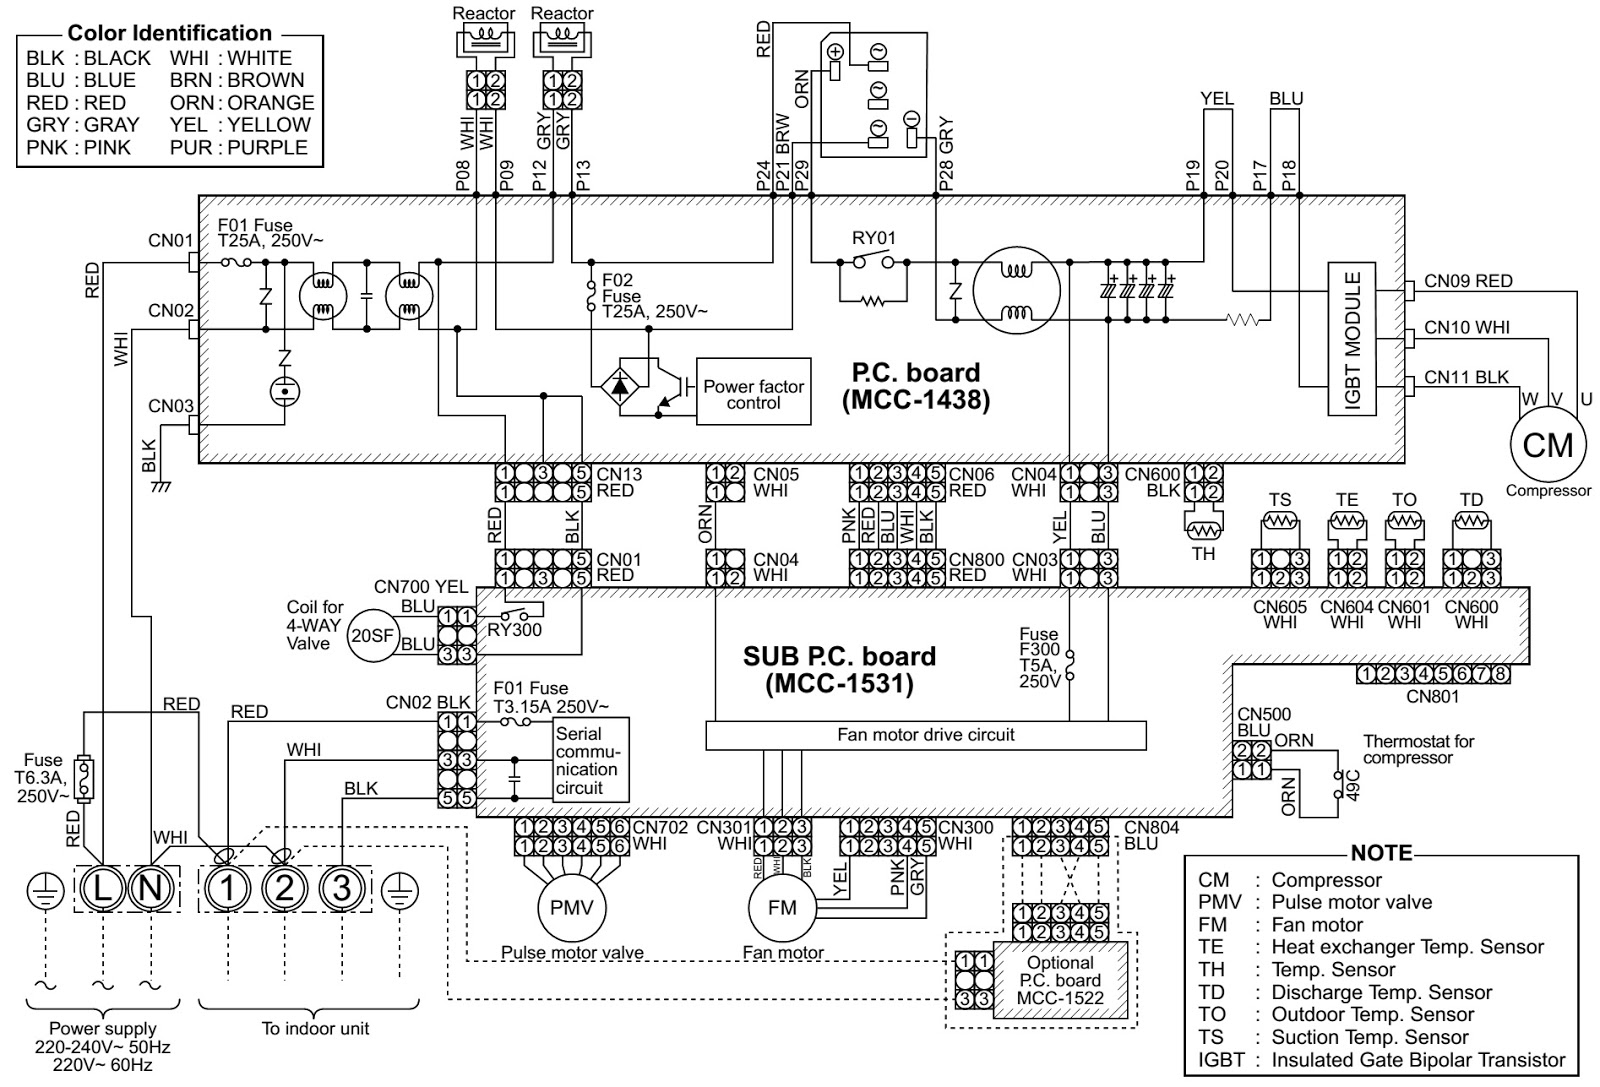 medium resolution of toshiba airconditioners split type wiring diagram digital toshiba air conditioning wiring diagram toshiba air conditioner installation manual